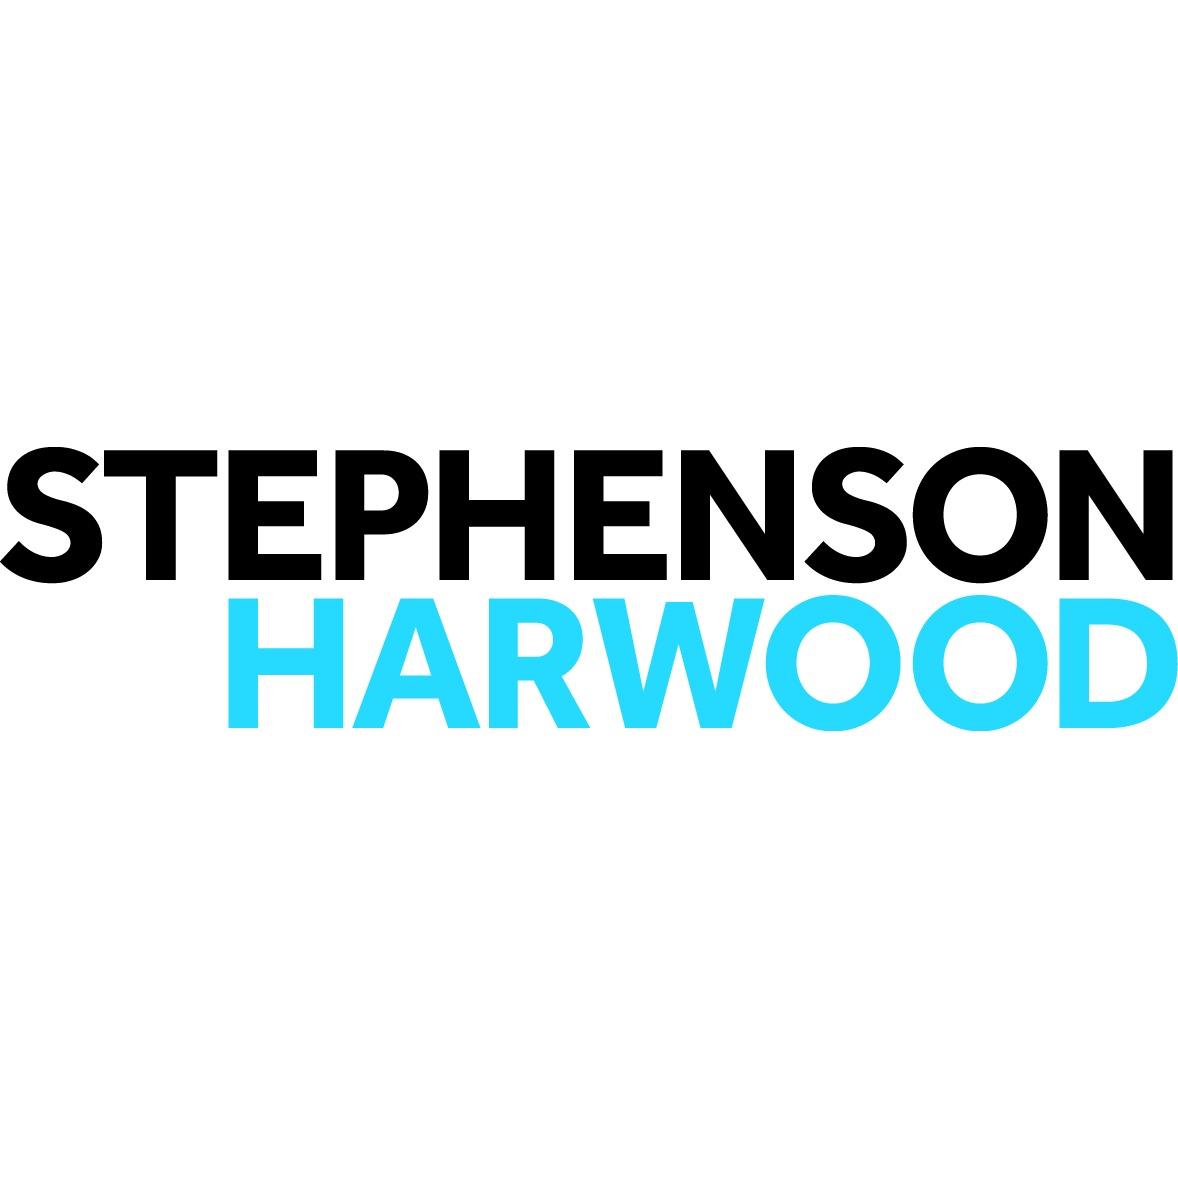 the Stephenson Harwood logo.